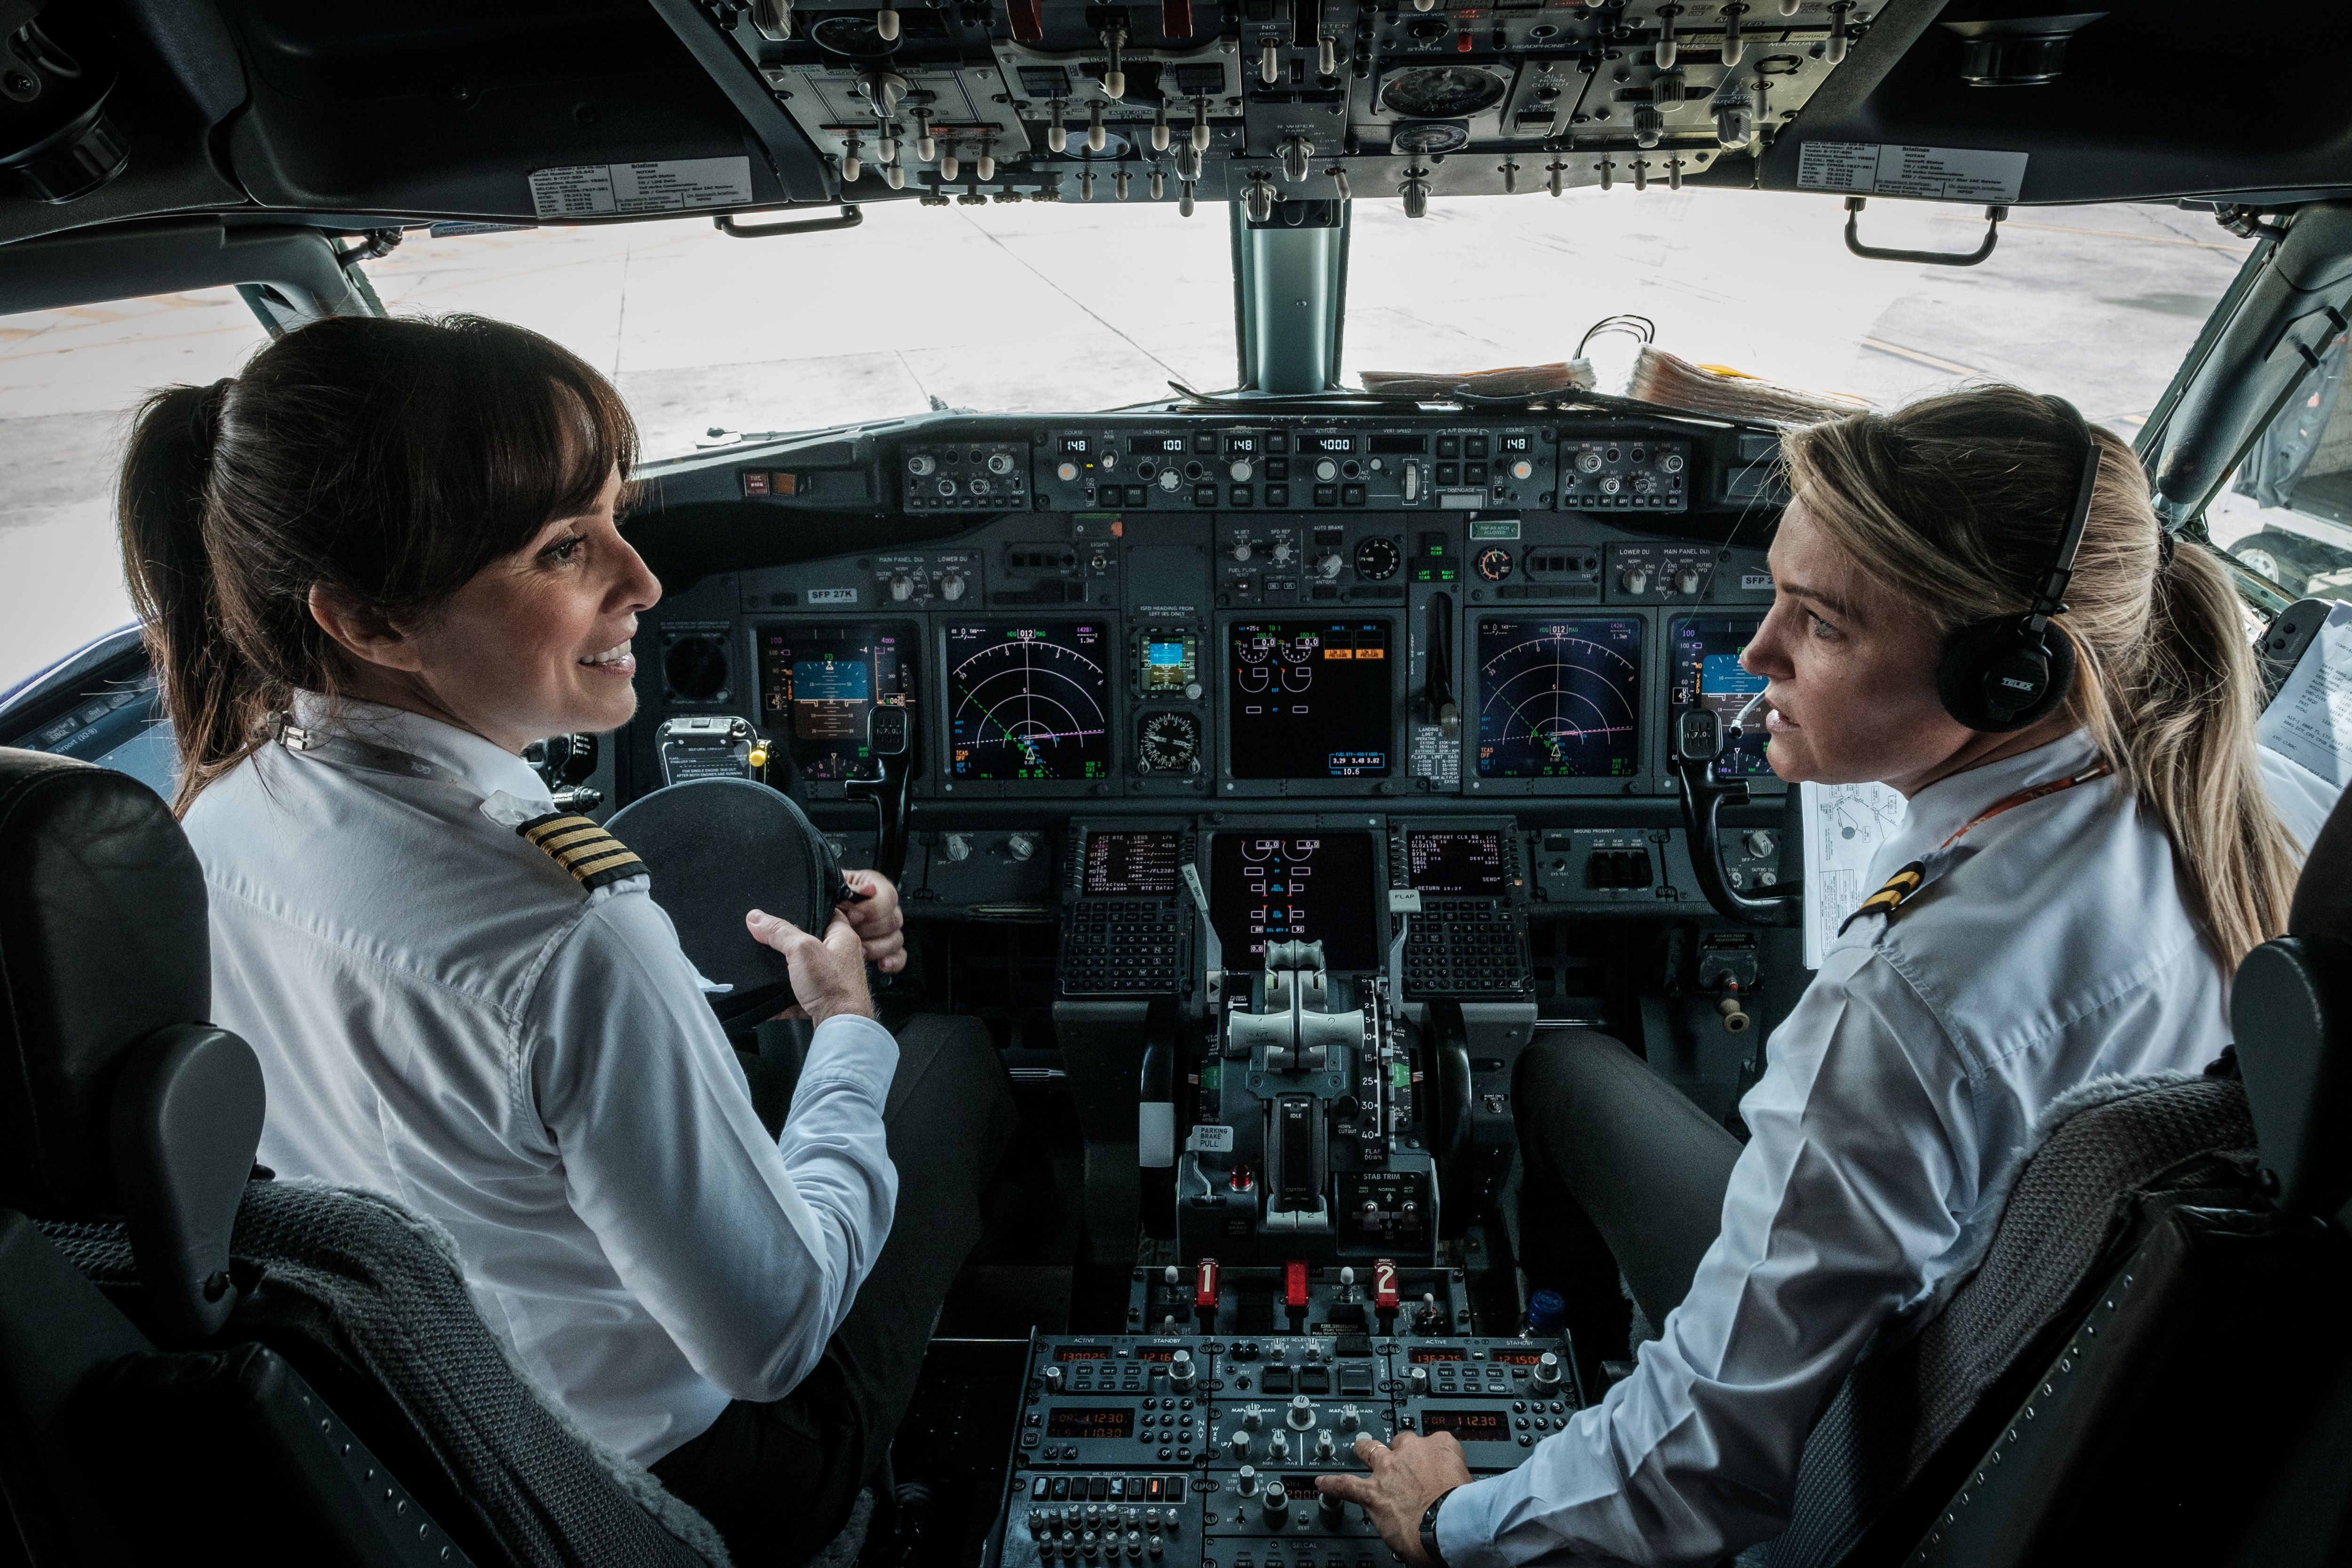 Brazilian airline GOL pilot Gabriela Carneiro Duarte (L) and her co-pilot prepare to take off on an all female crew flight to mark International Women's Day at Tom Jobim international airport, in Rio de Janeiro, Brazil, on March 8, 2017.